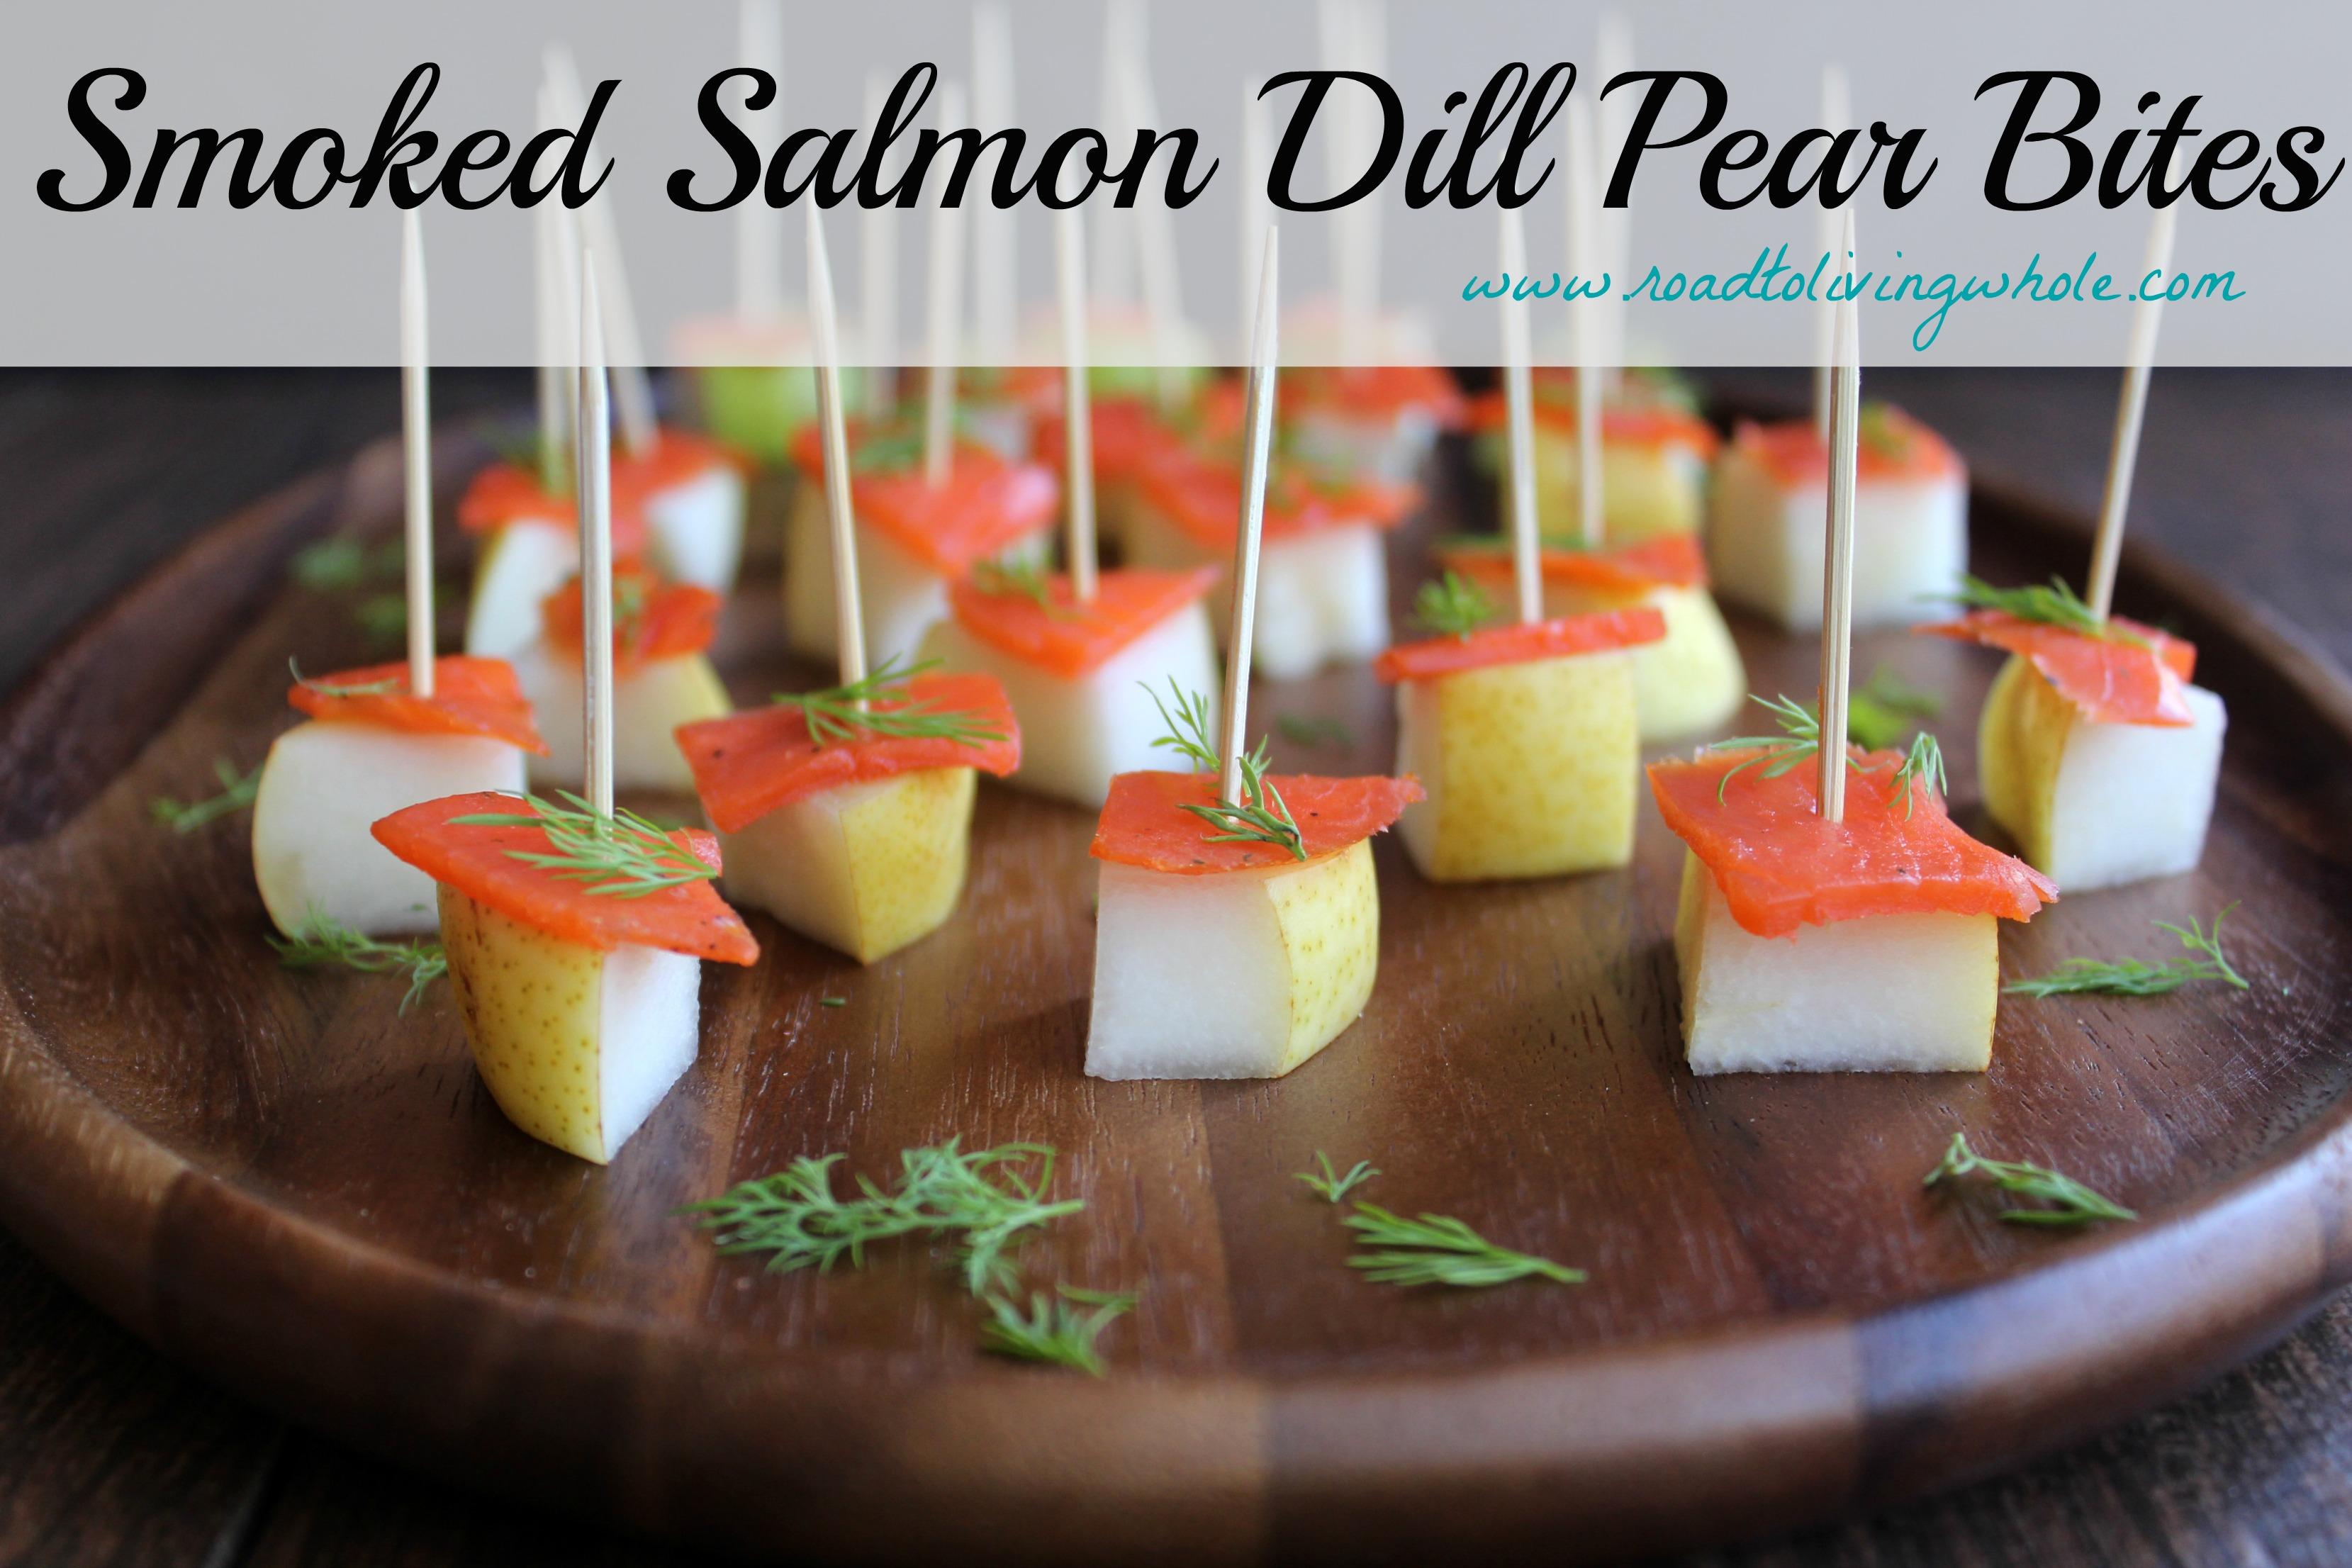 salmon dill pear bites